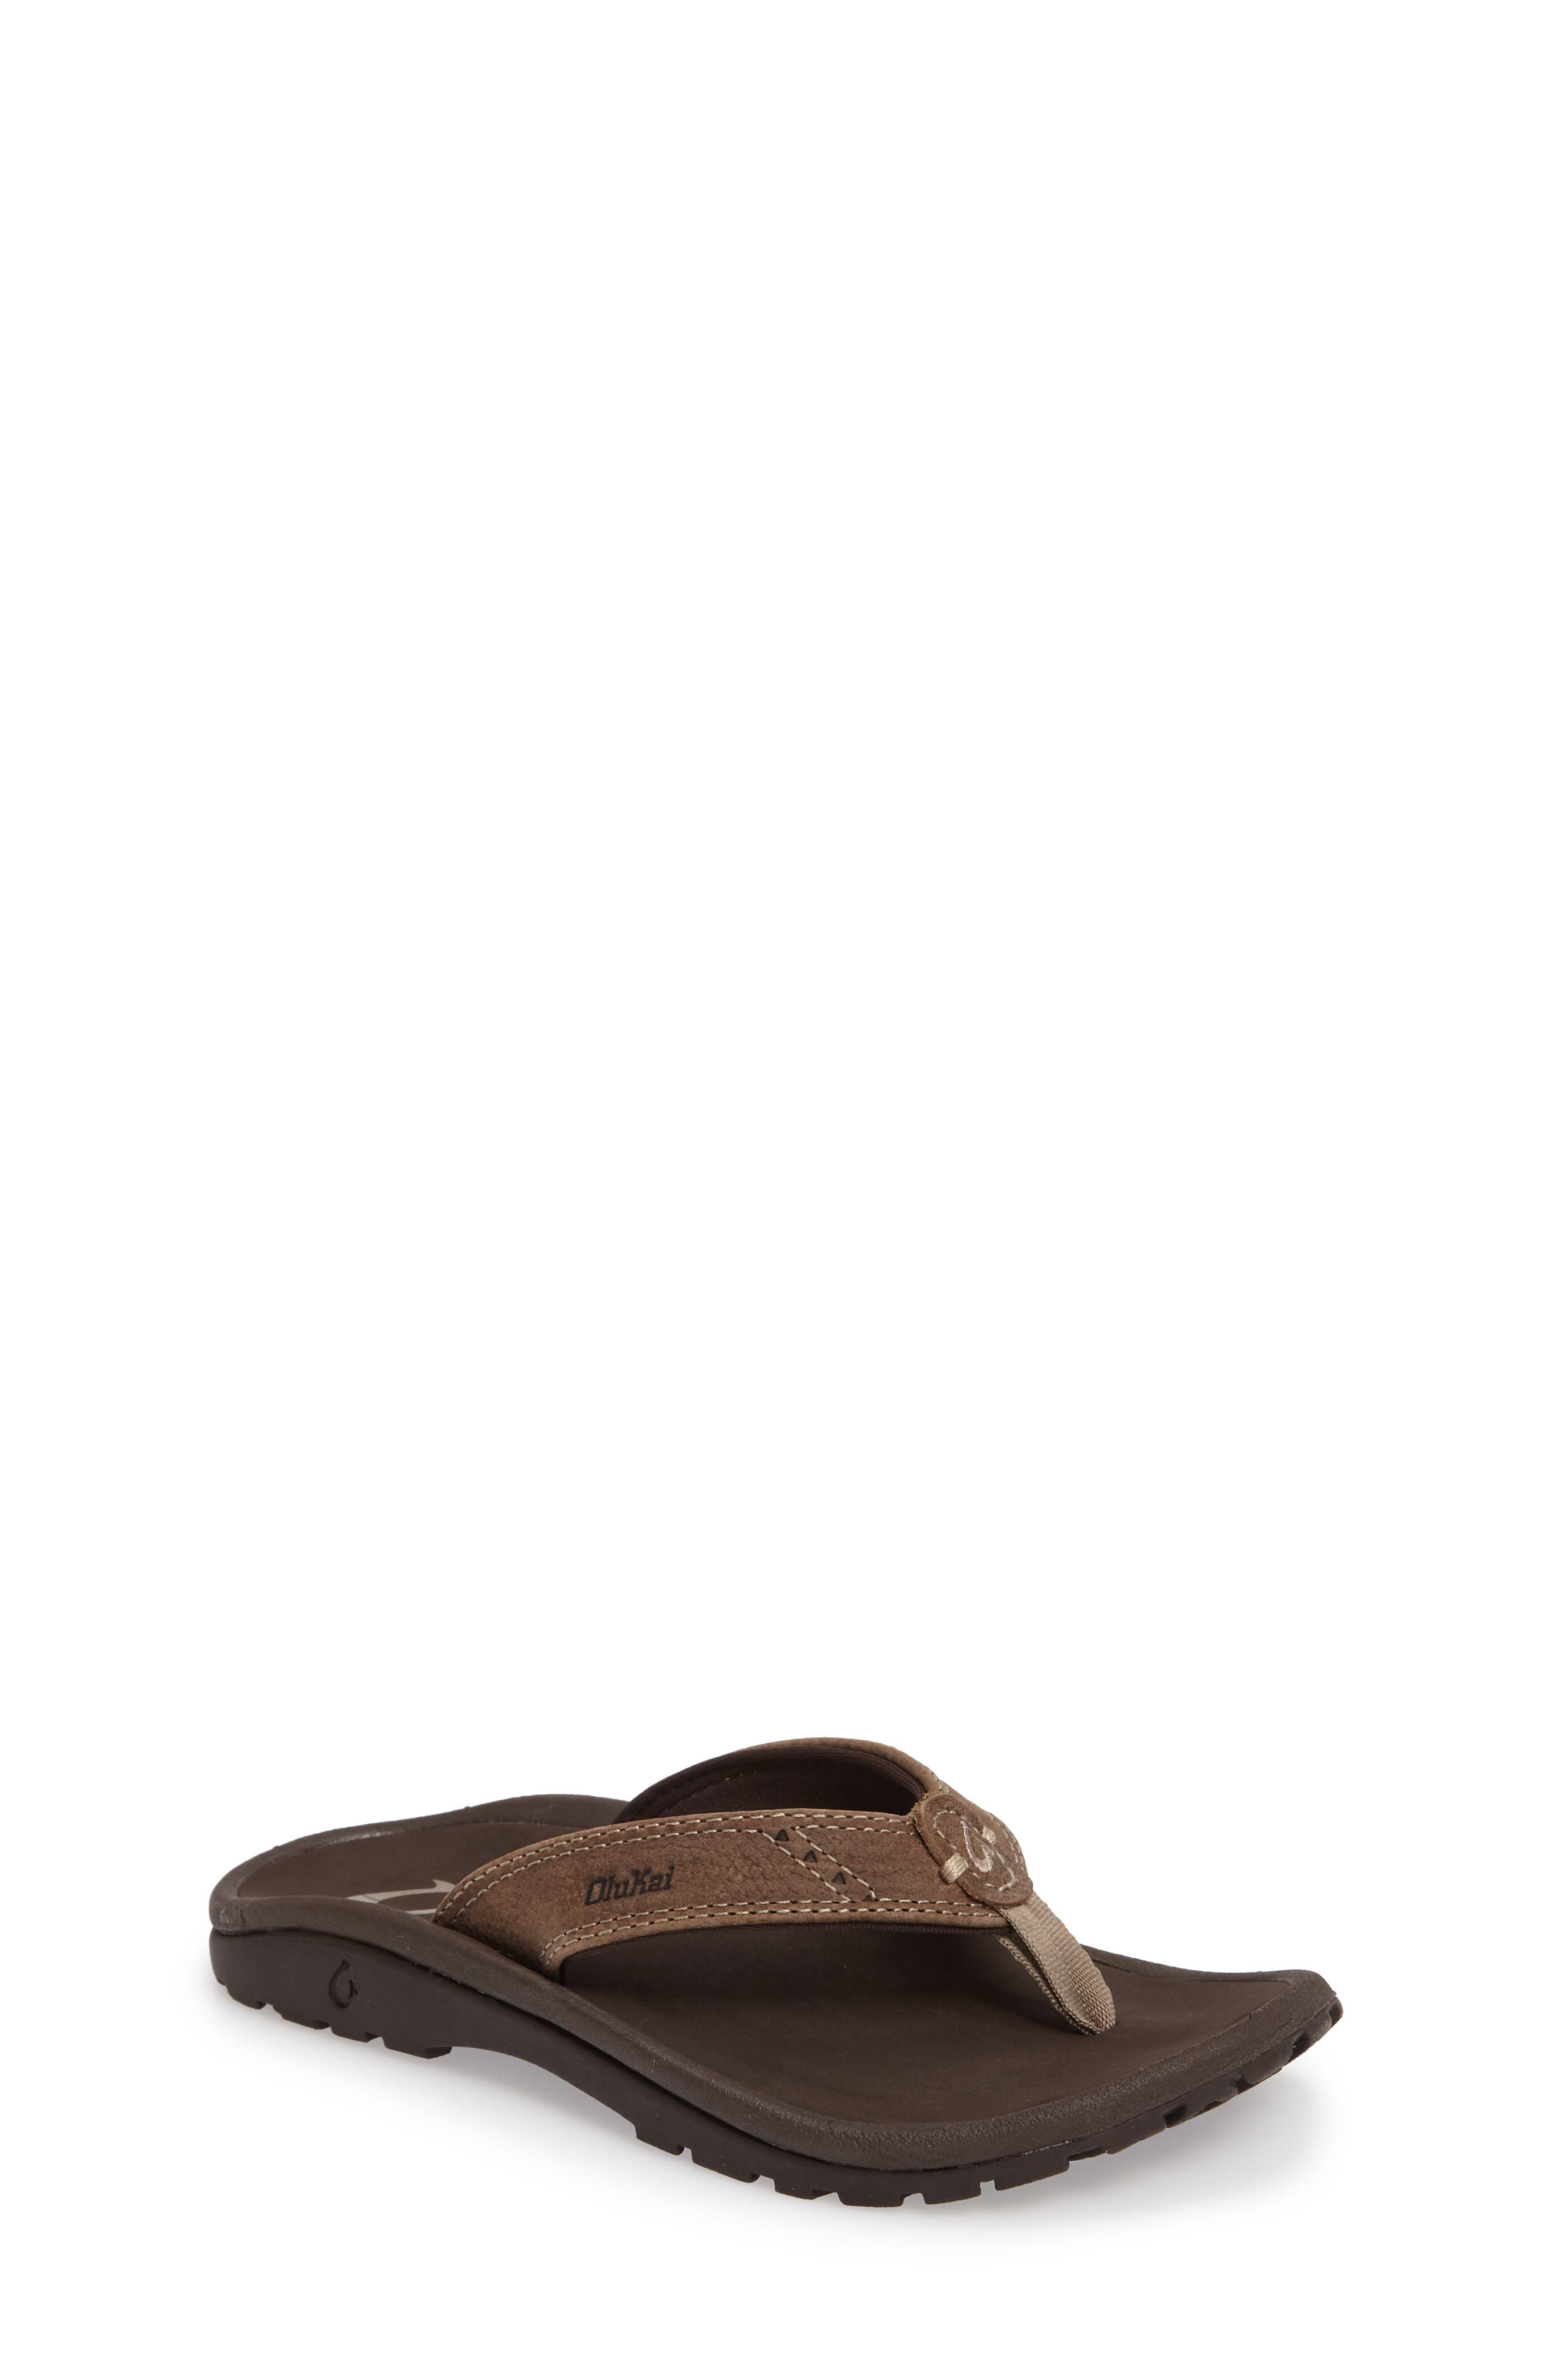 Nui Leather Flip Flop,                             Main thumbnail 1, color,                             CLAY/ DARK JAVA